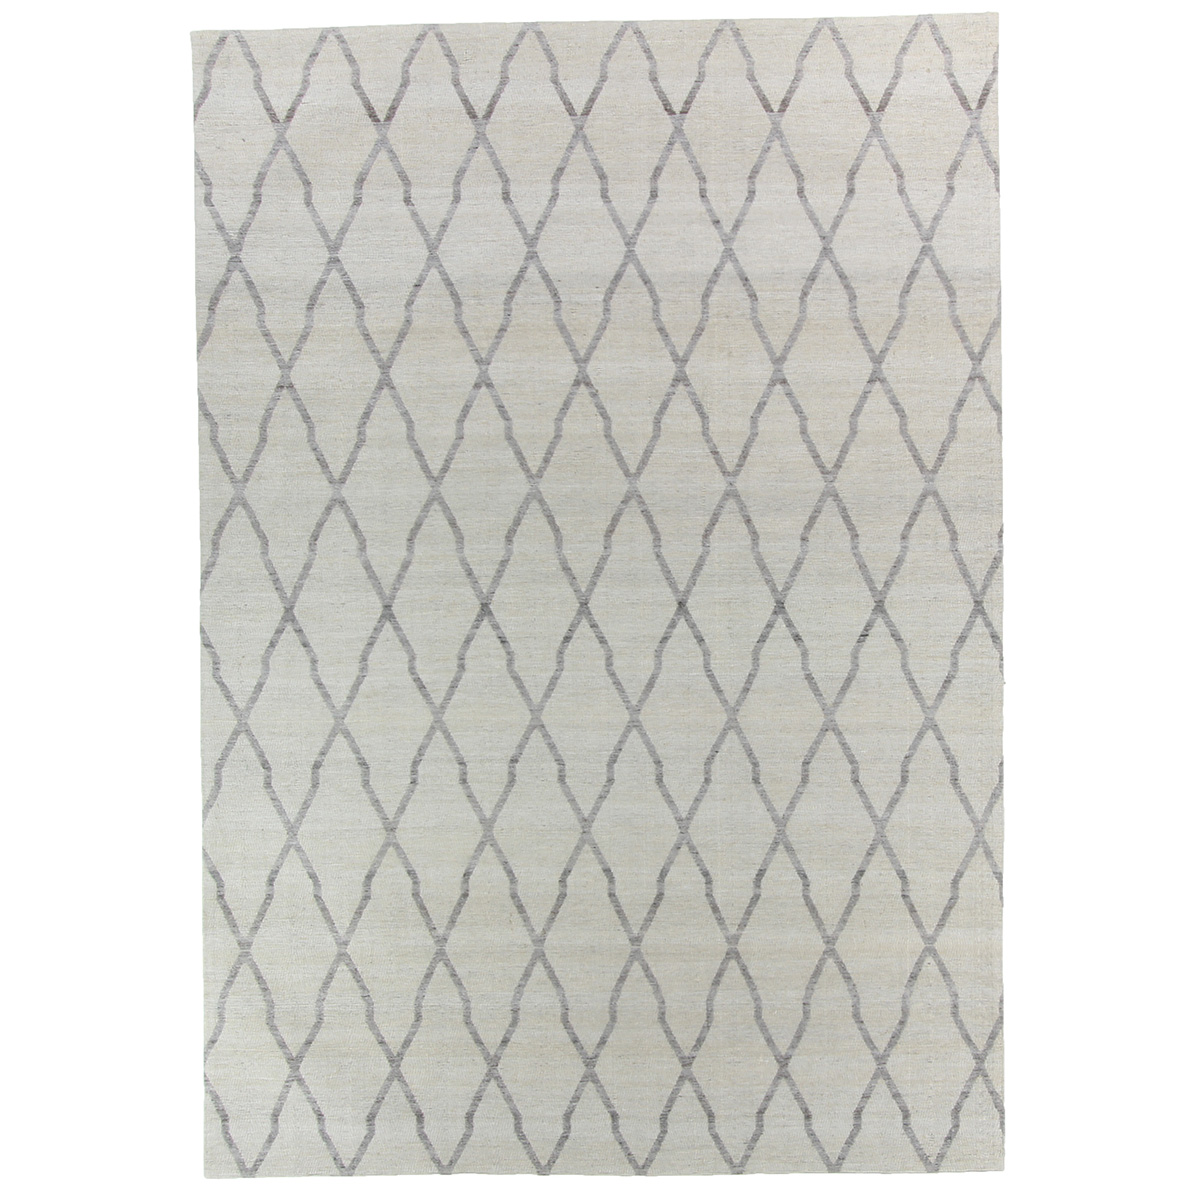 Vloerkleed Brinker Sjock Ivory | 160 x 230 cm